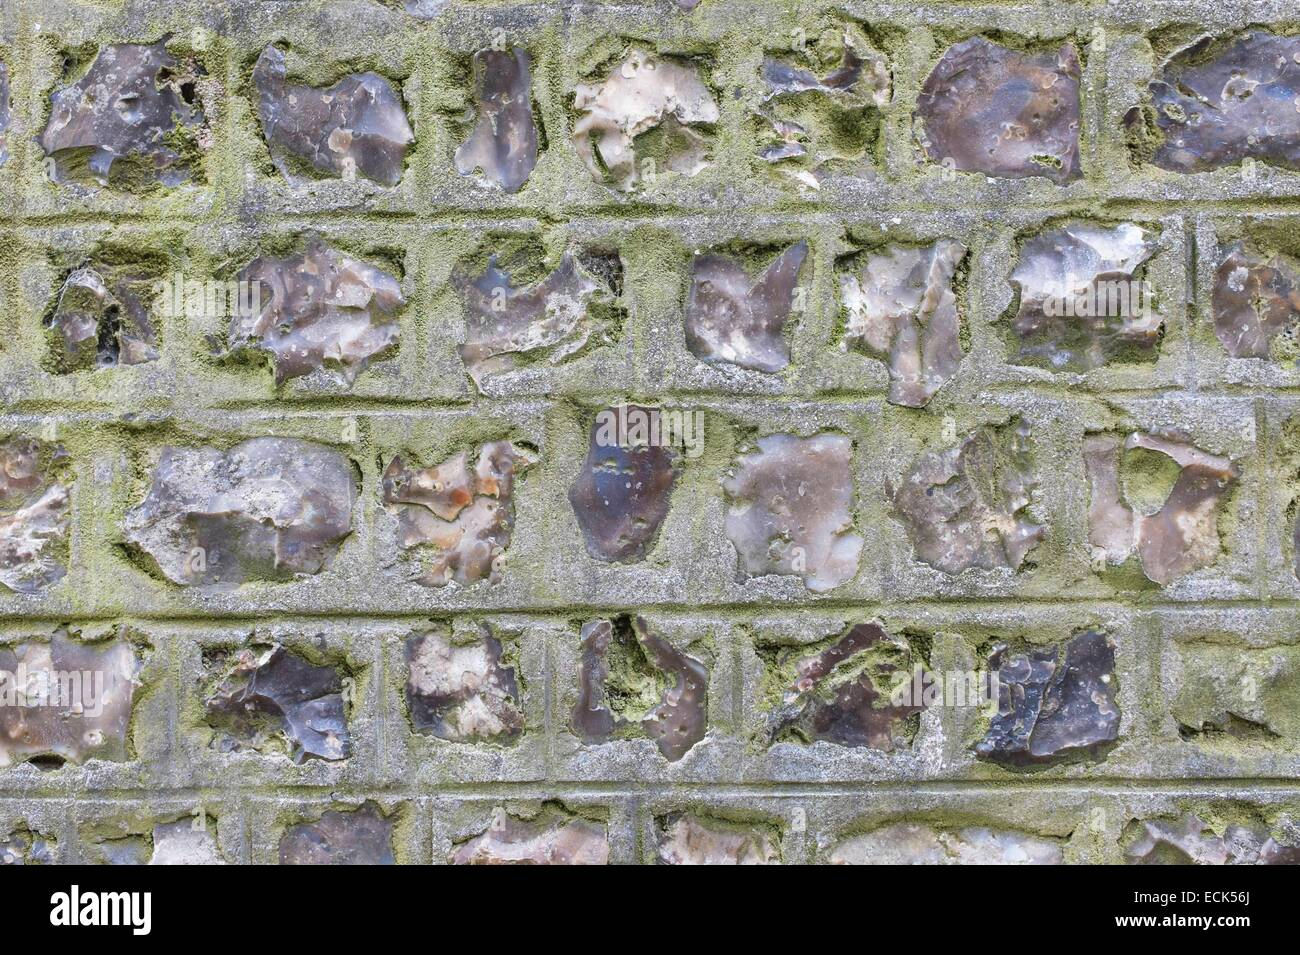 France, Seine Maritime, Etretat, stone and flint typical architecture - Stock Image